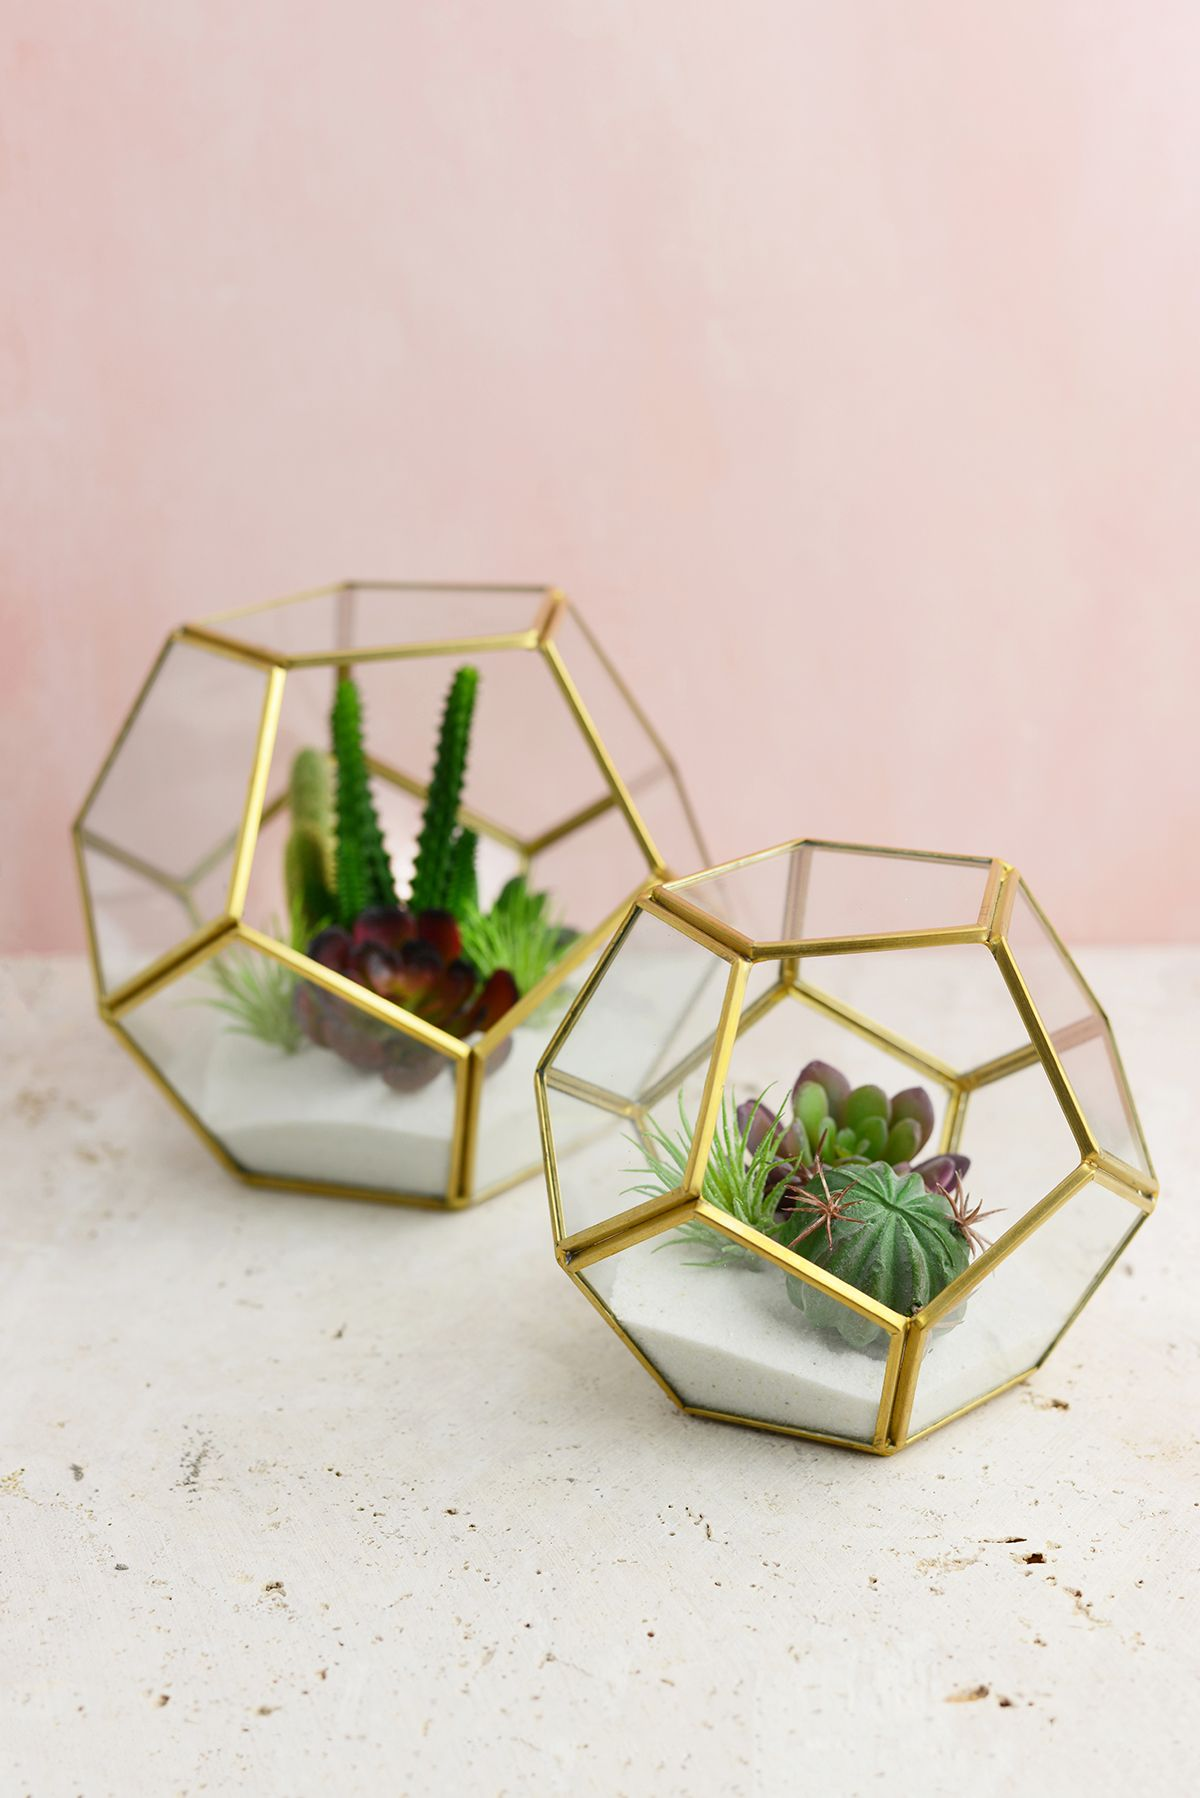 Hira Glass & Brass Terrarium Display Box 75X 75